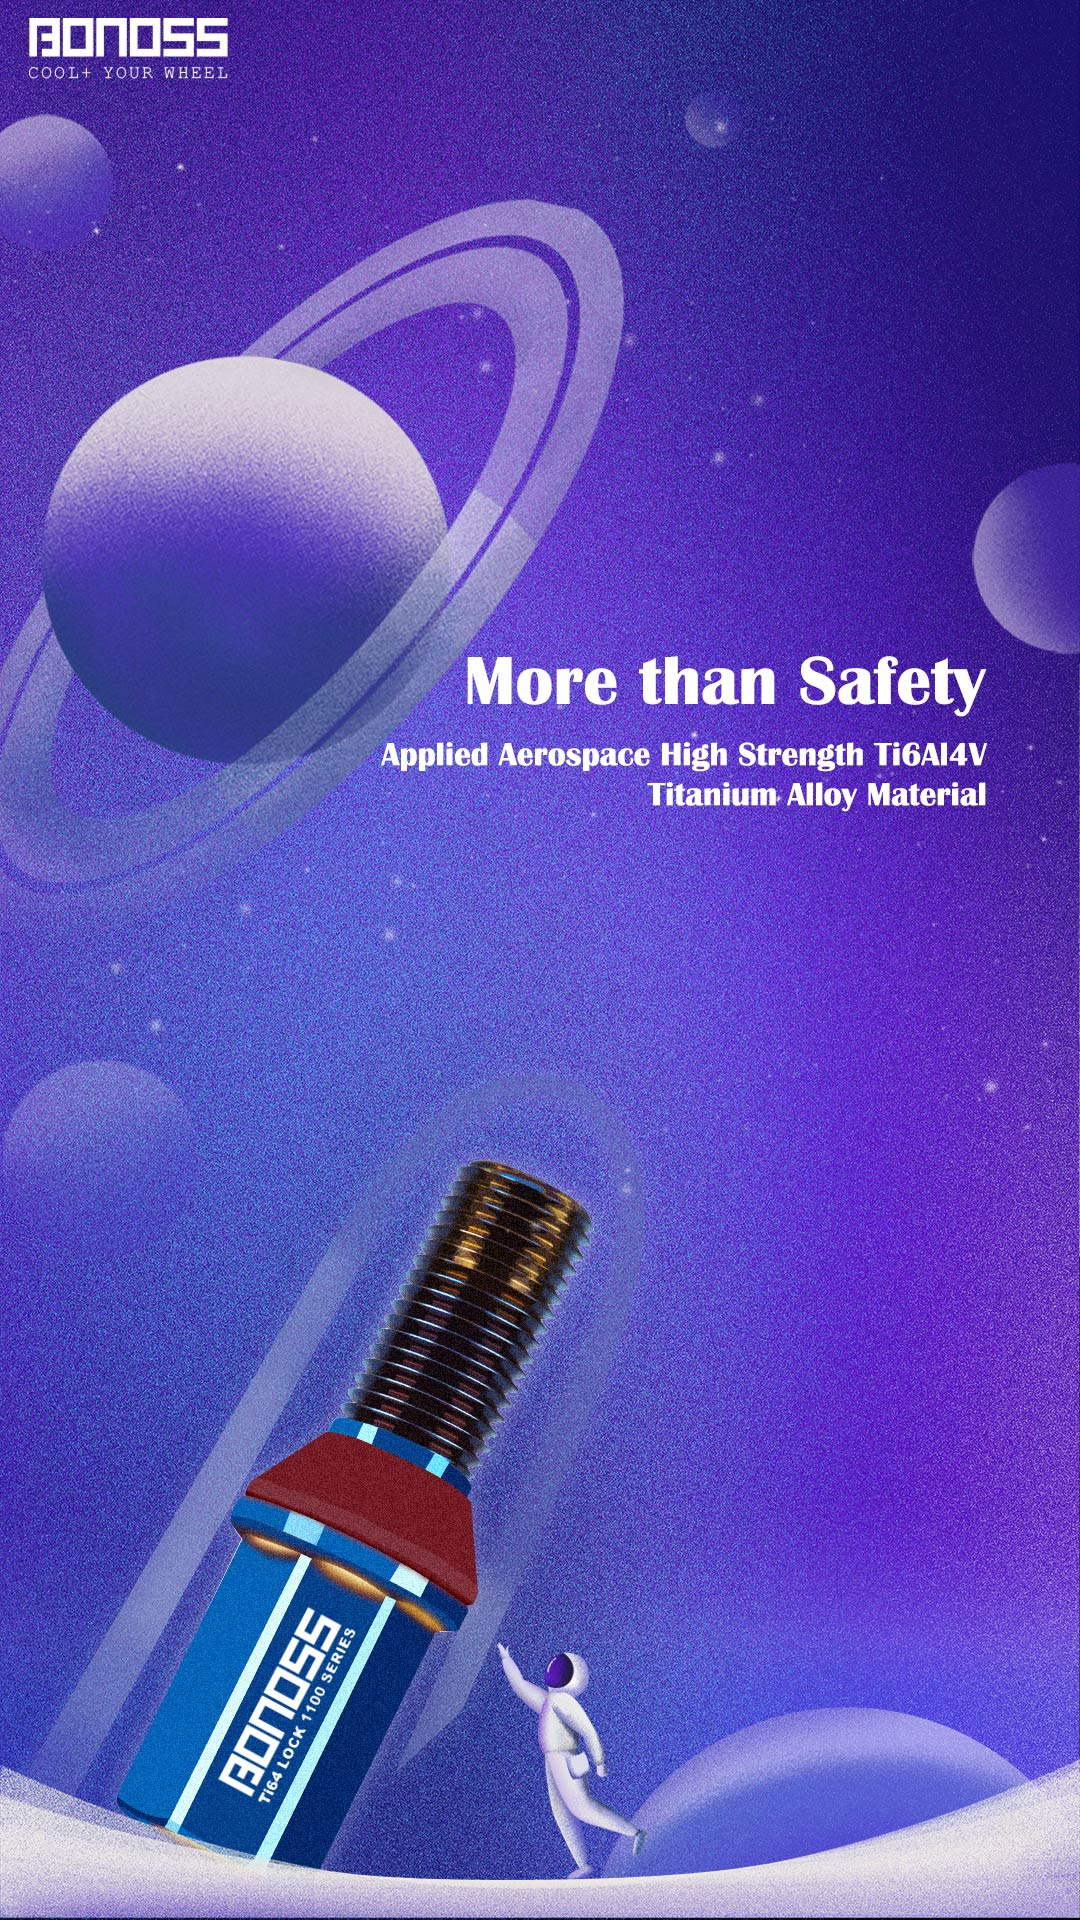 BONOSS-Forged-Titanium-Wheel-Bolts-Keeping-Safety